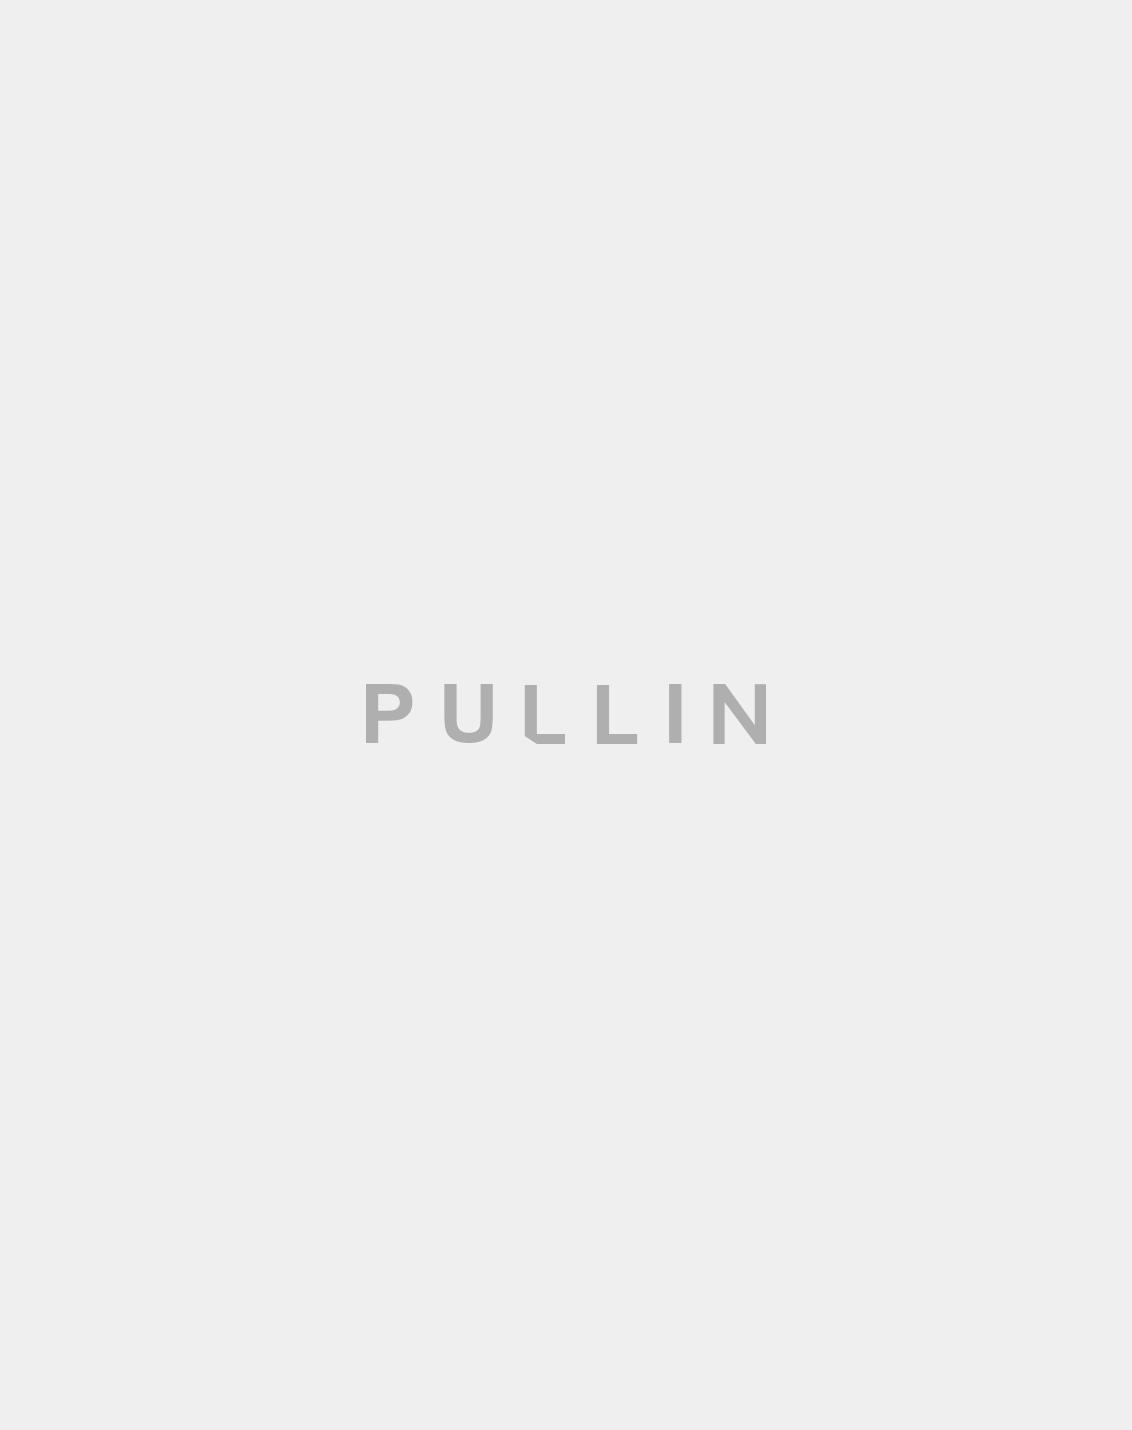 Key holder bp0691 unisex - pullin 1